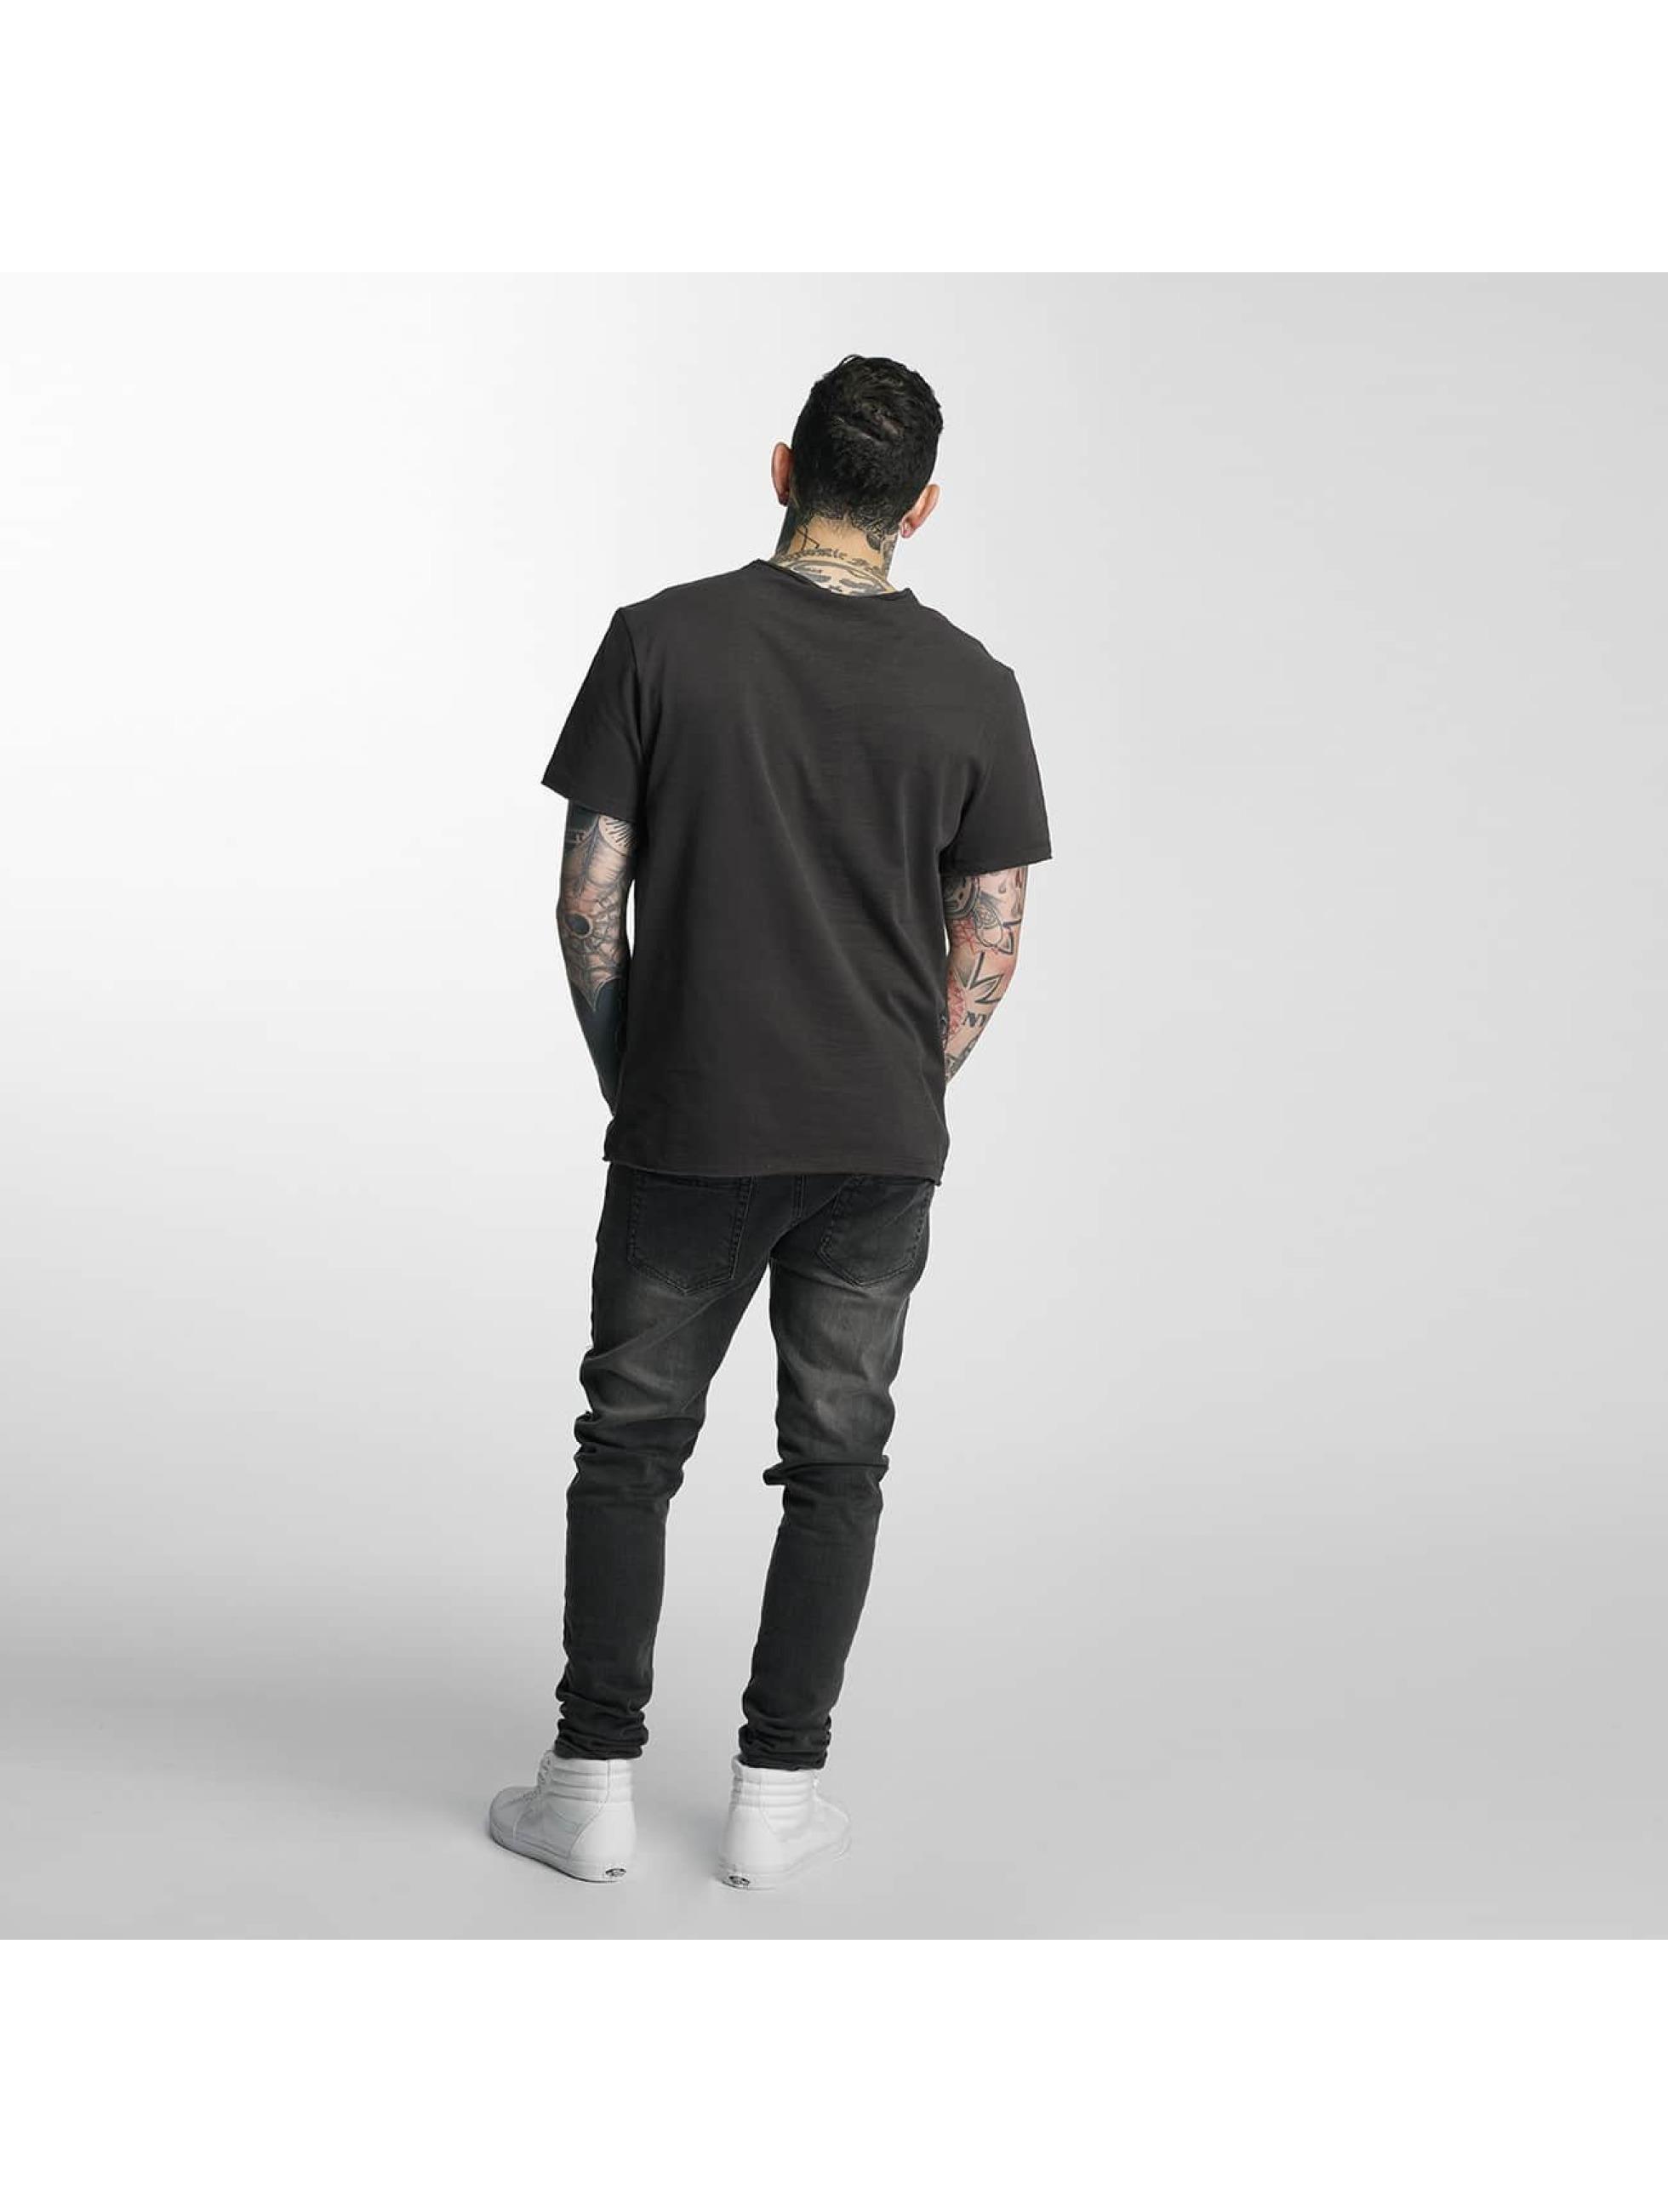 Amplified T-Shirt David Bowie Blackstar grey